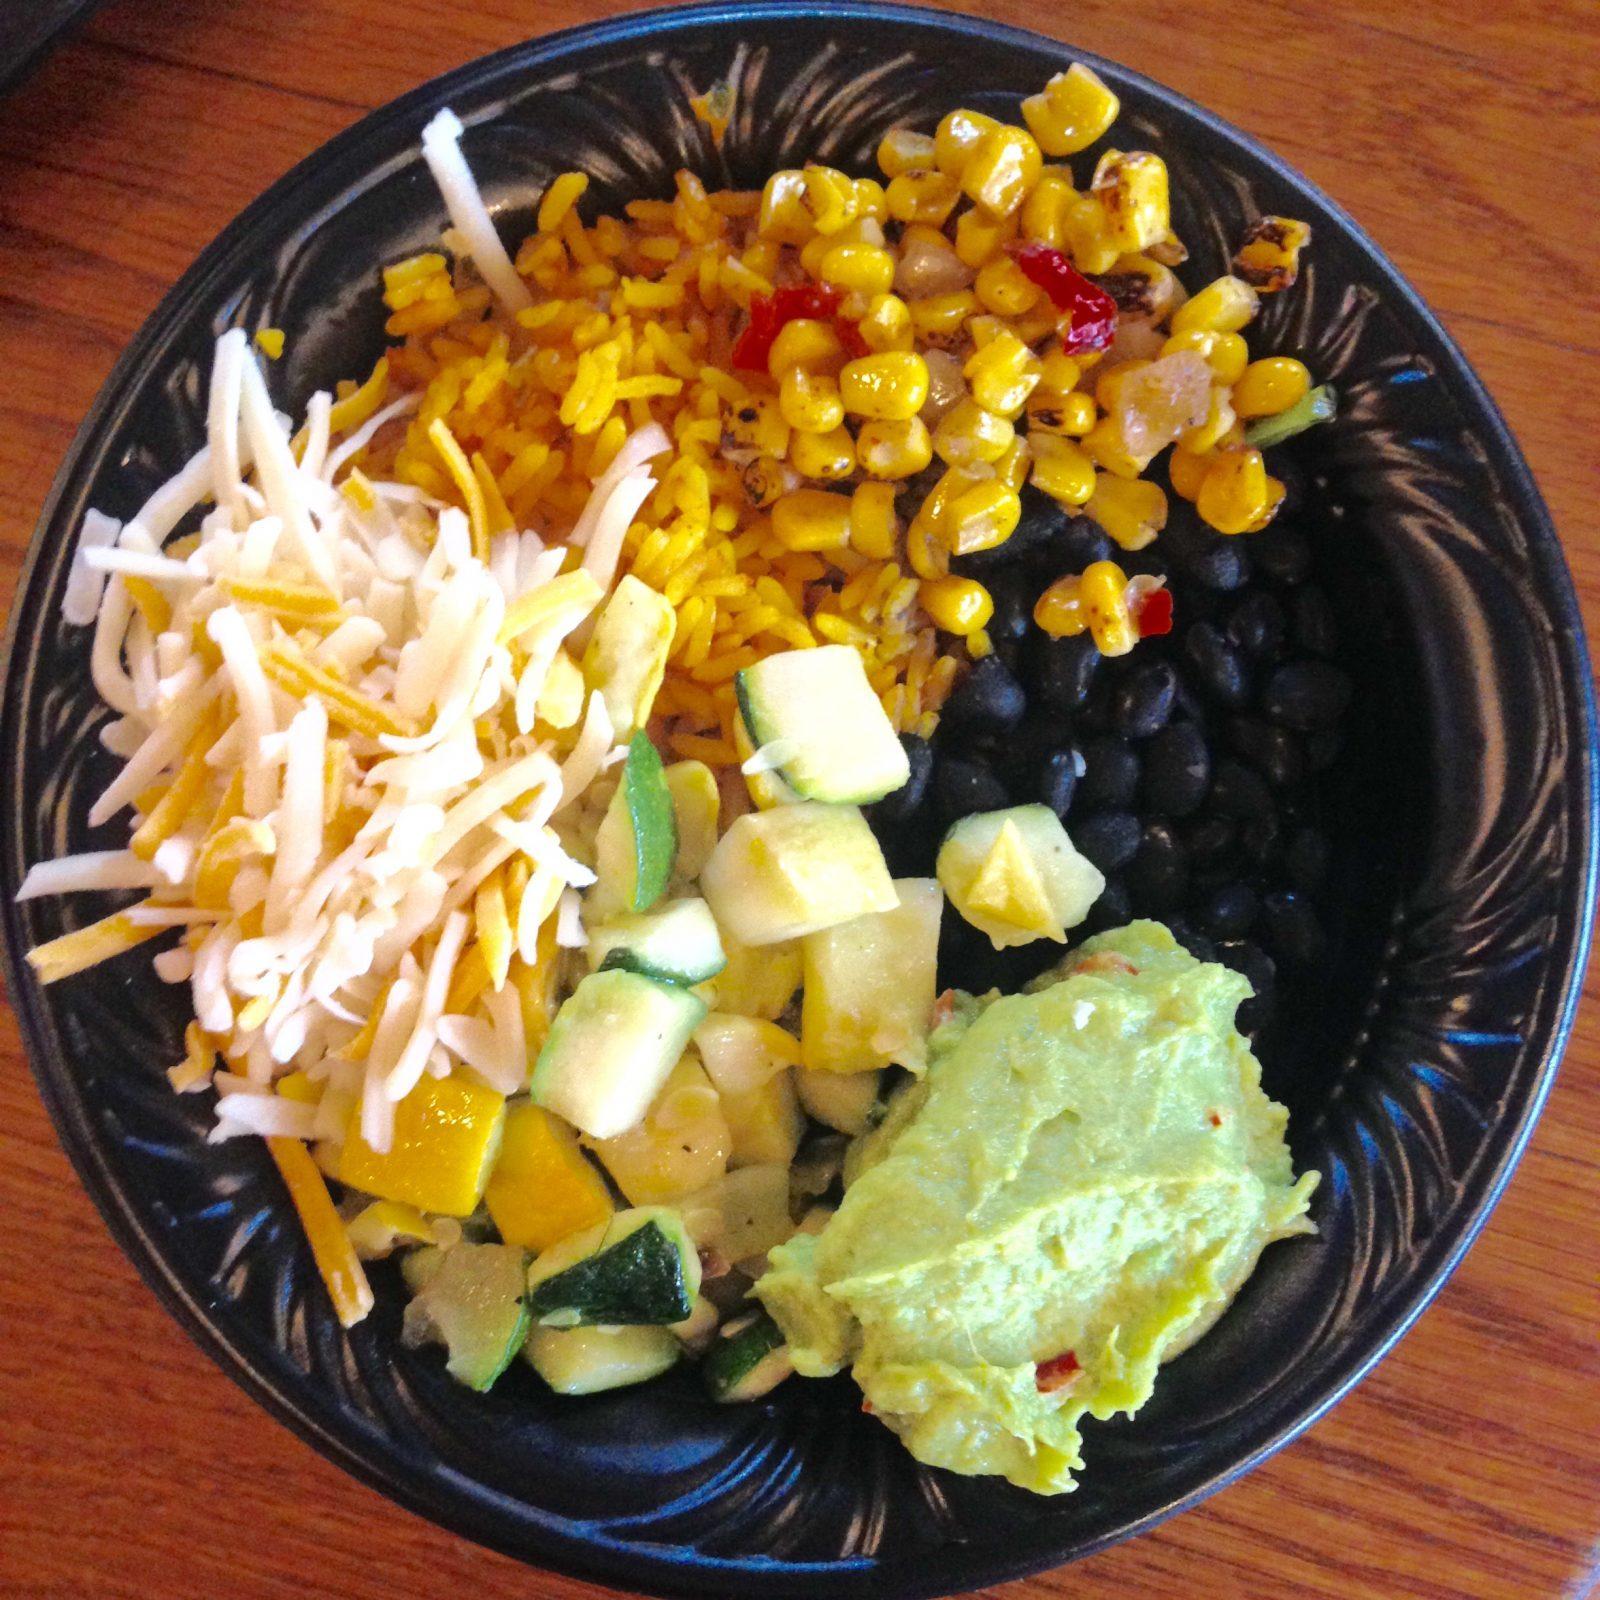 Veggie Bowl at Pecos Bill's, Magic Kingdom